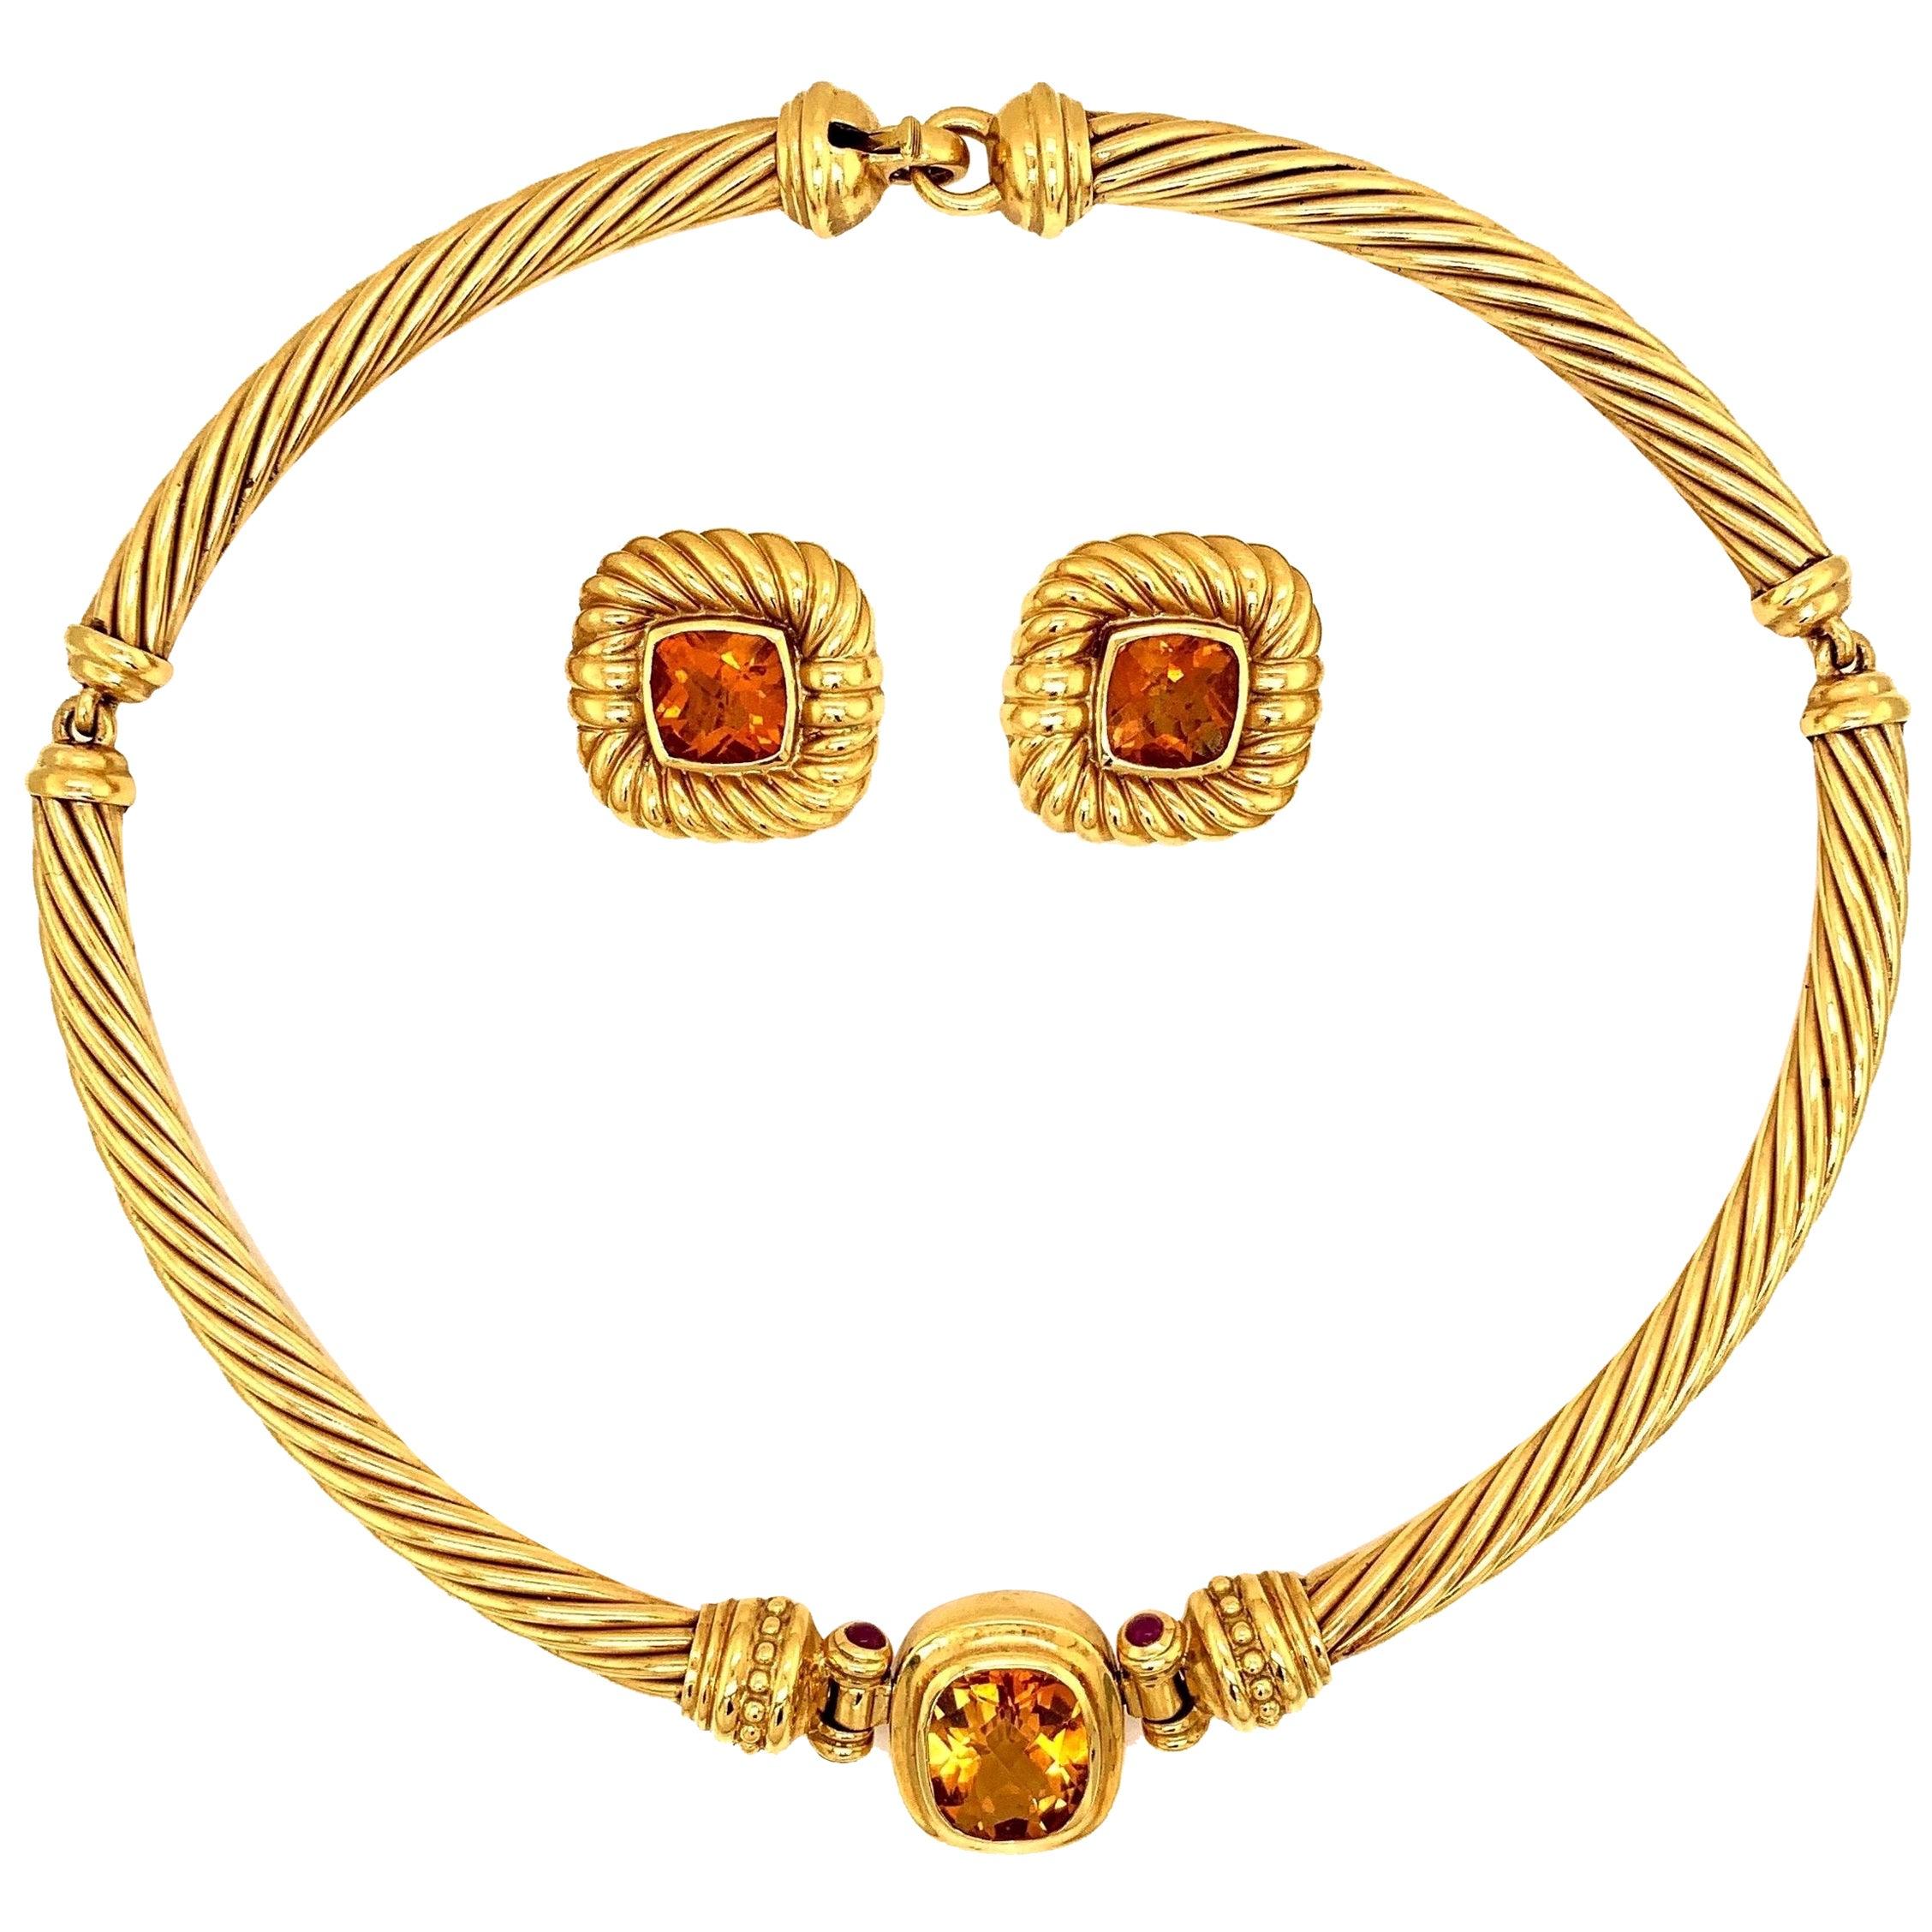 David Yurman 18 Karat Yellow Gold Citrine Choker Necklace and Earrings